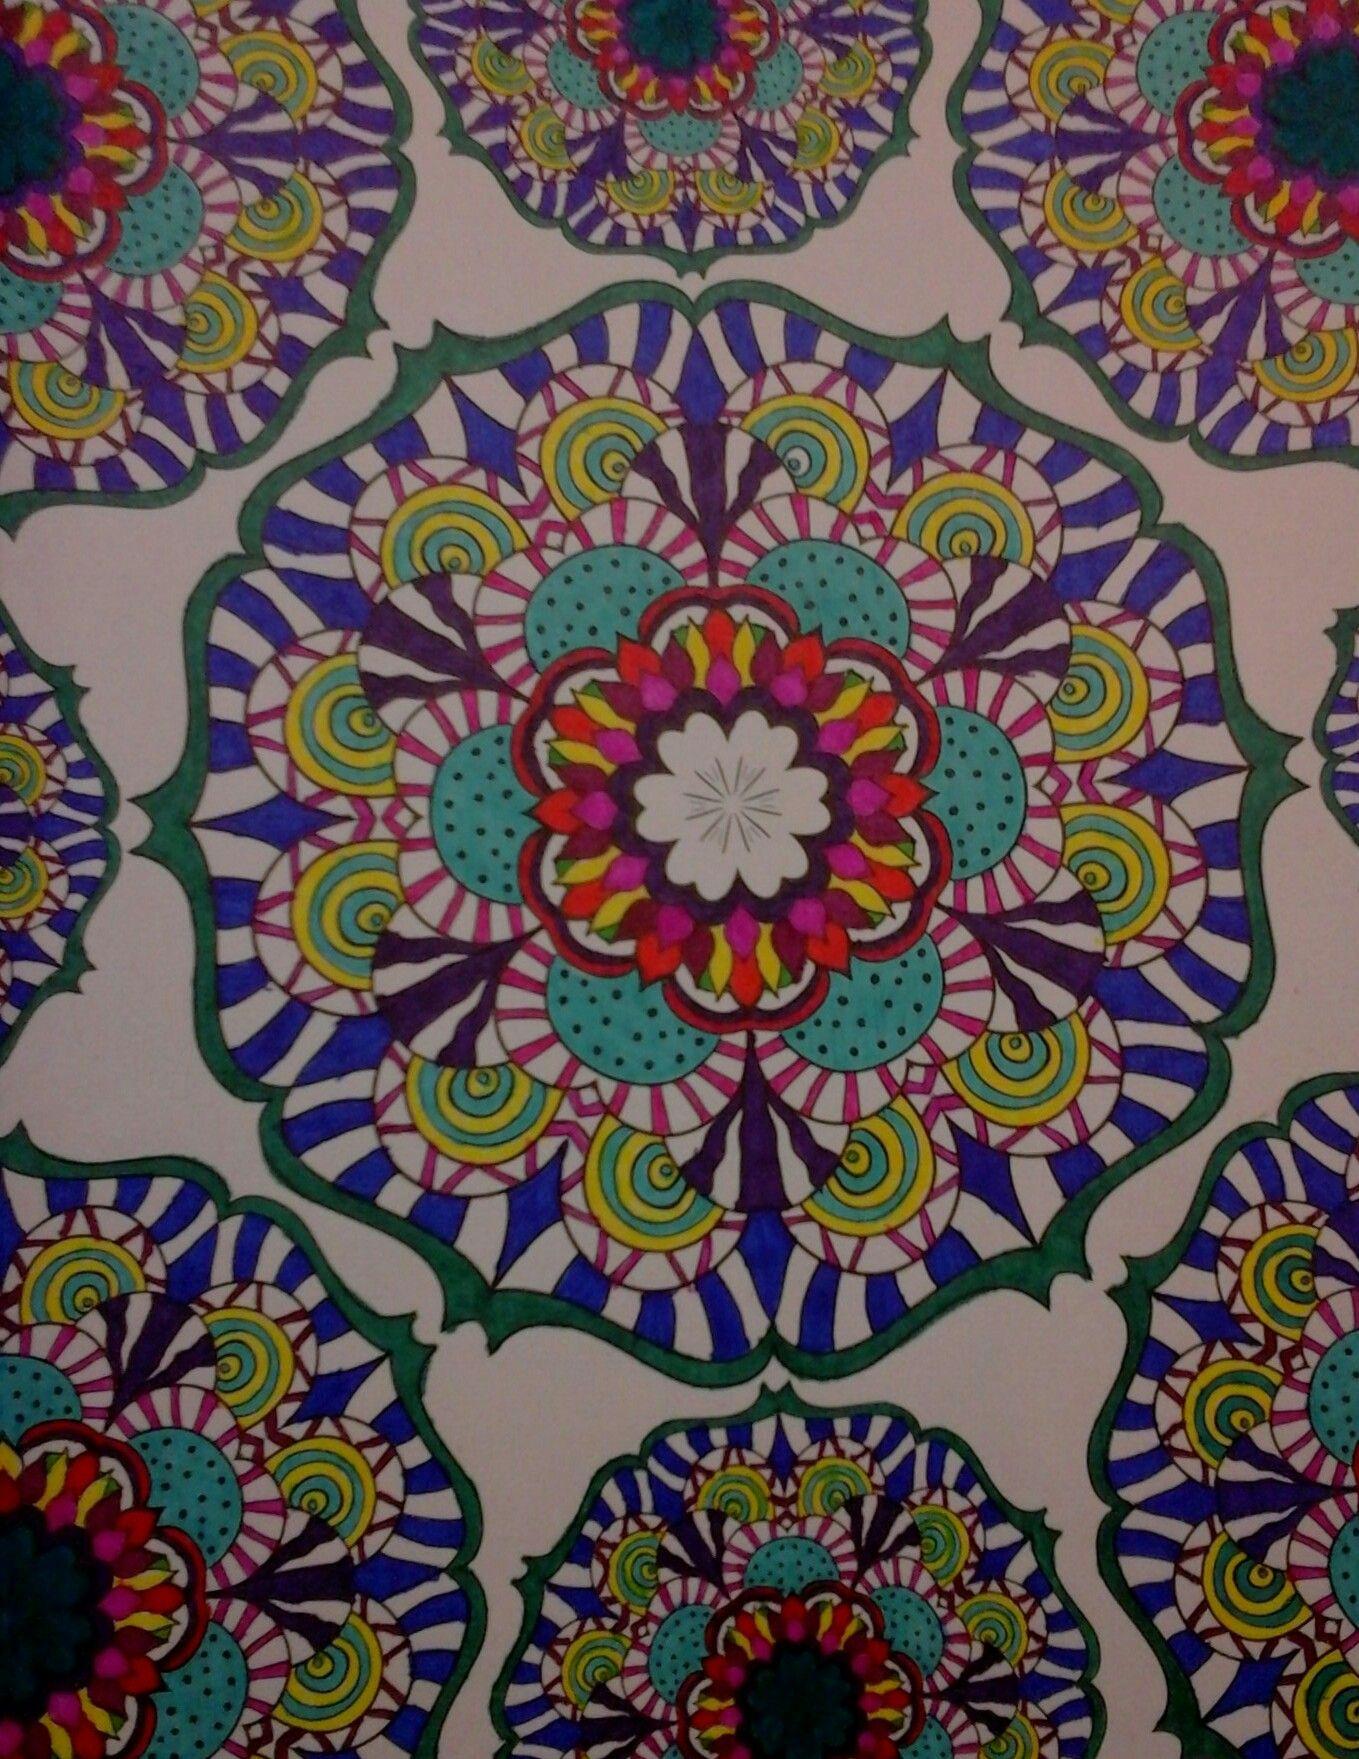 - Mandala Wonders Color Art For Everyone Colorful Art, Art, Mandala